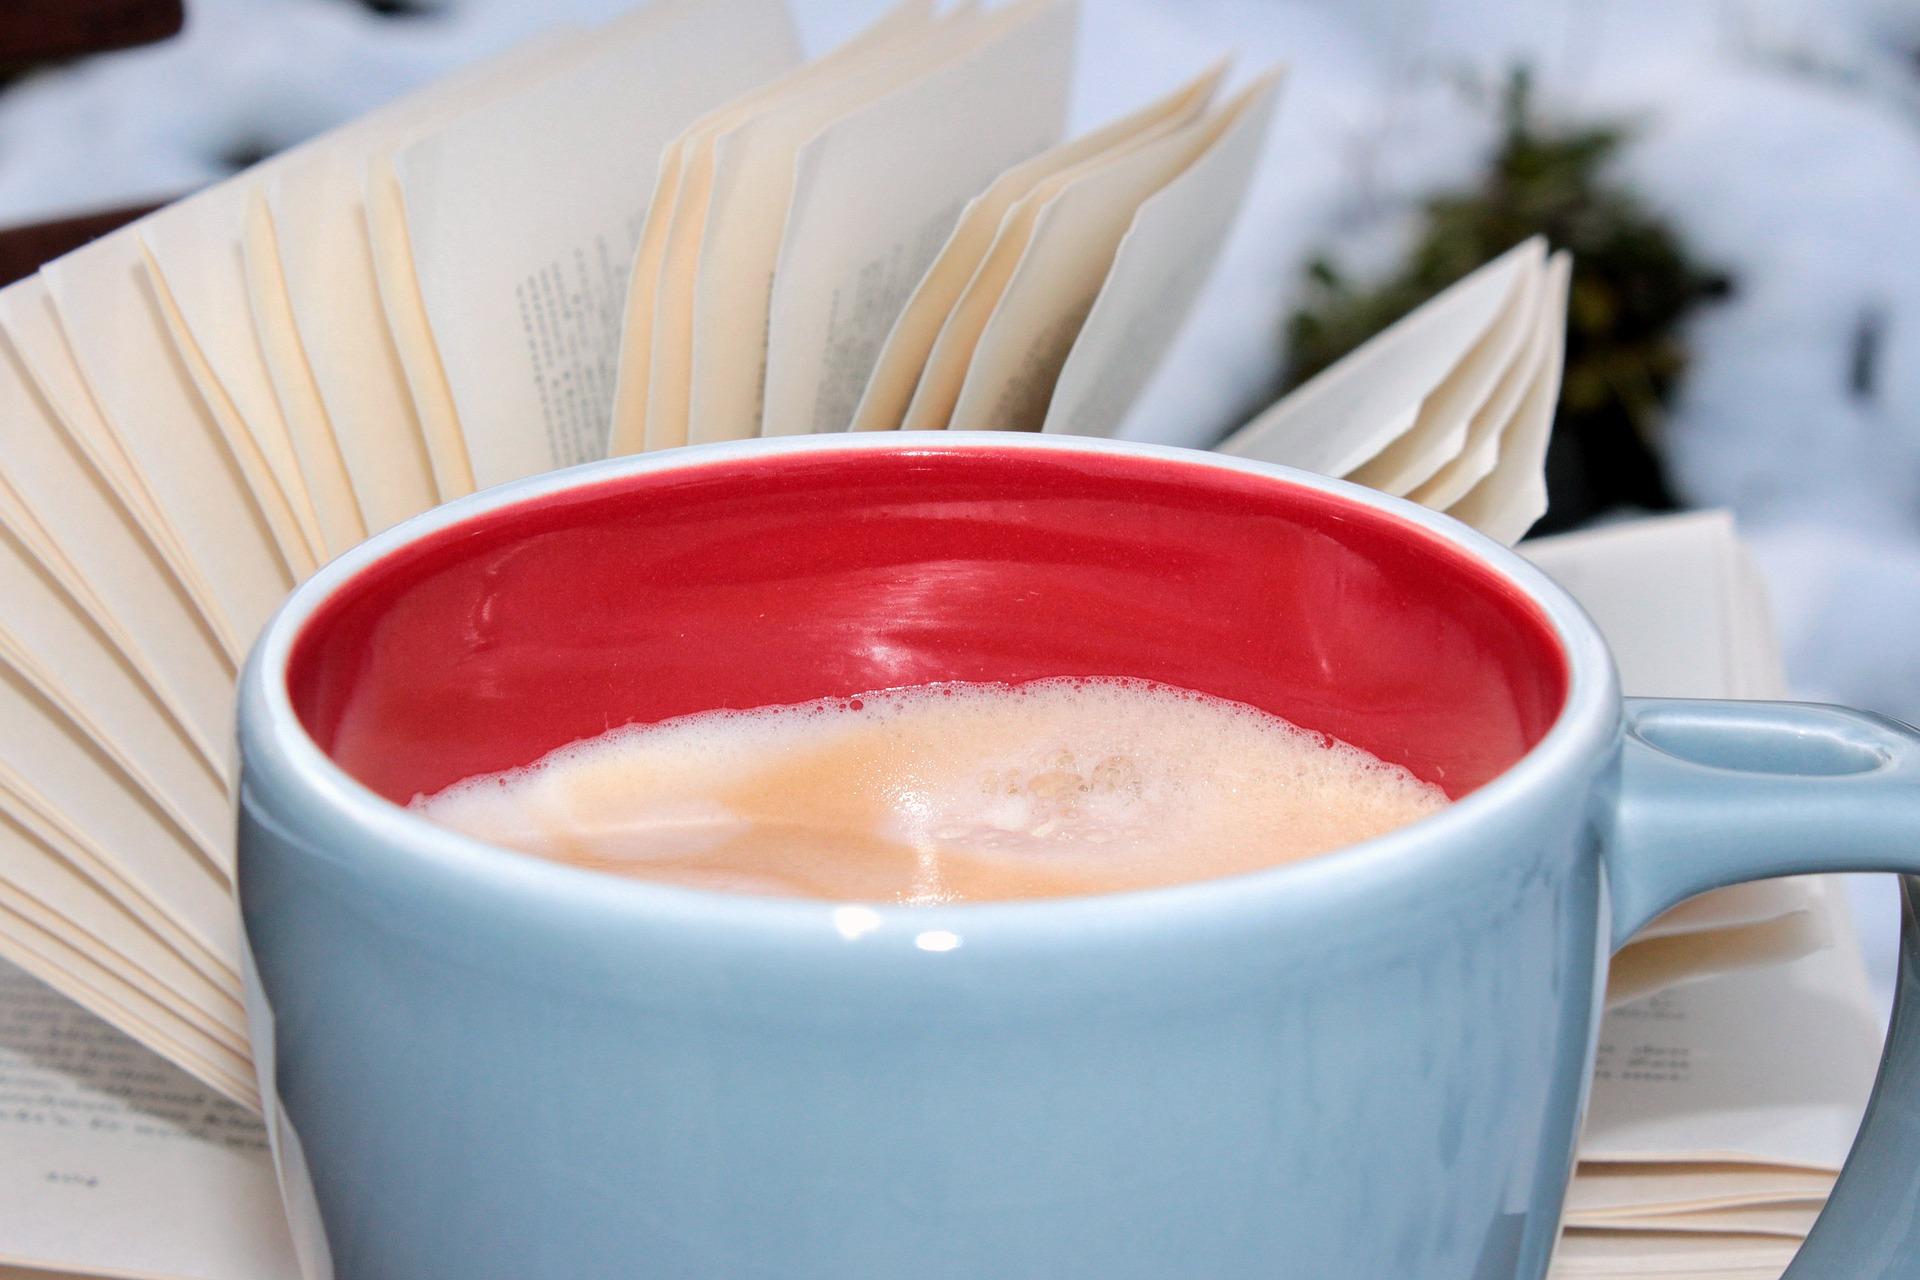 Books & Coffee | © Pixabay